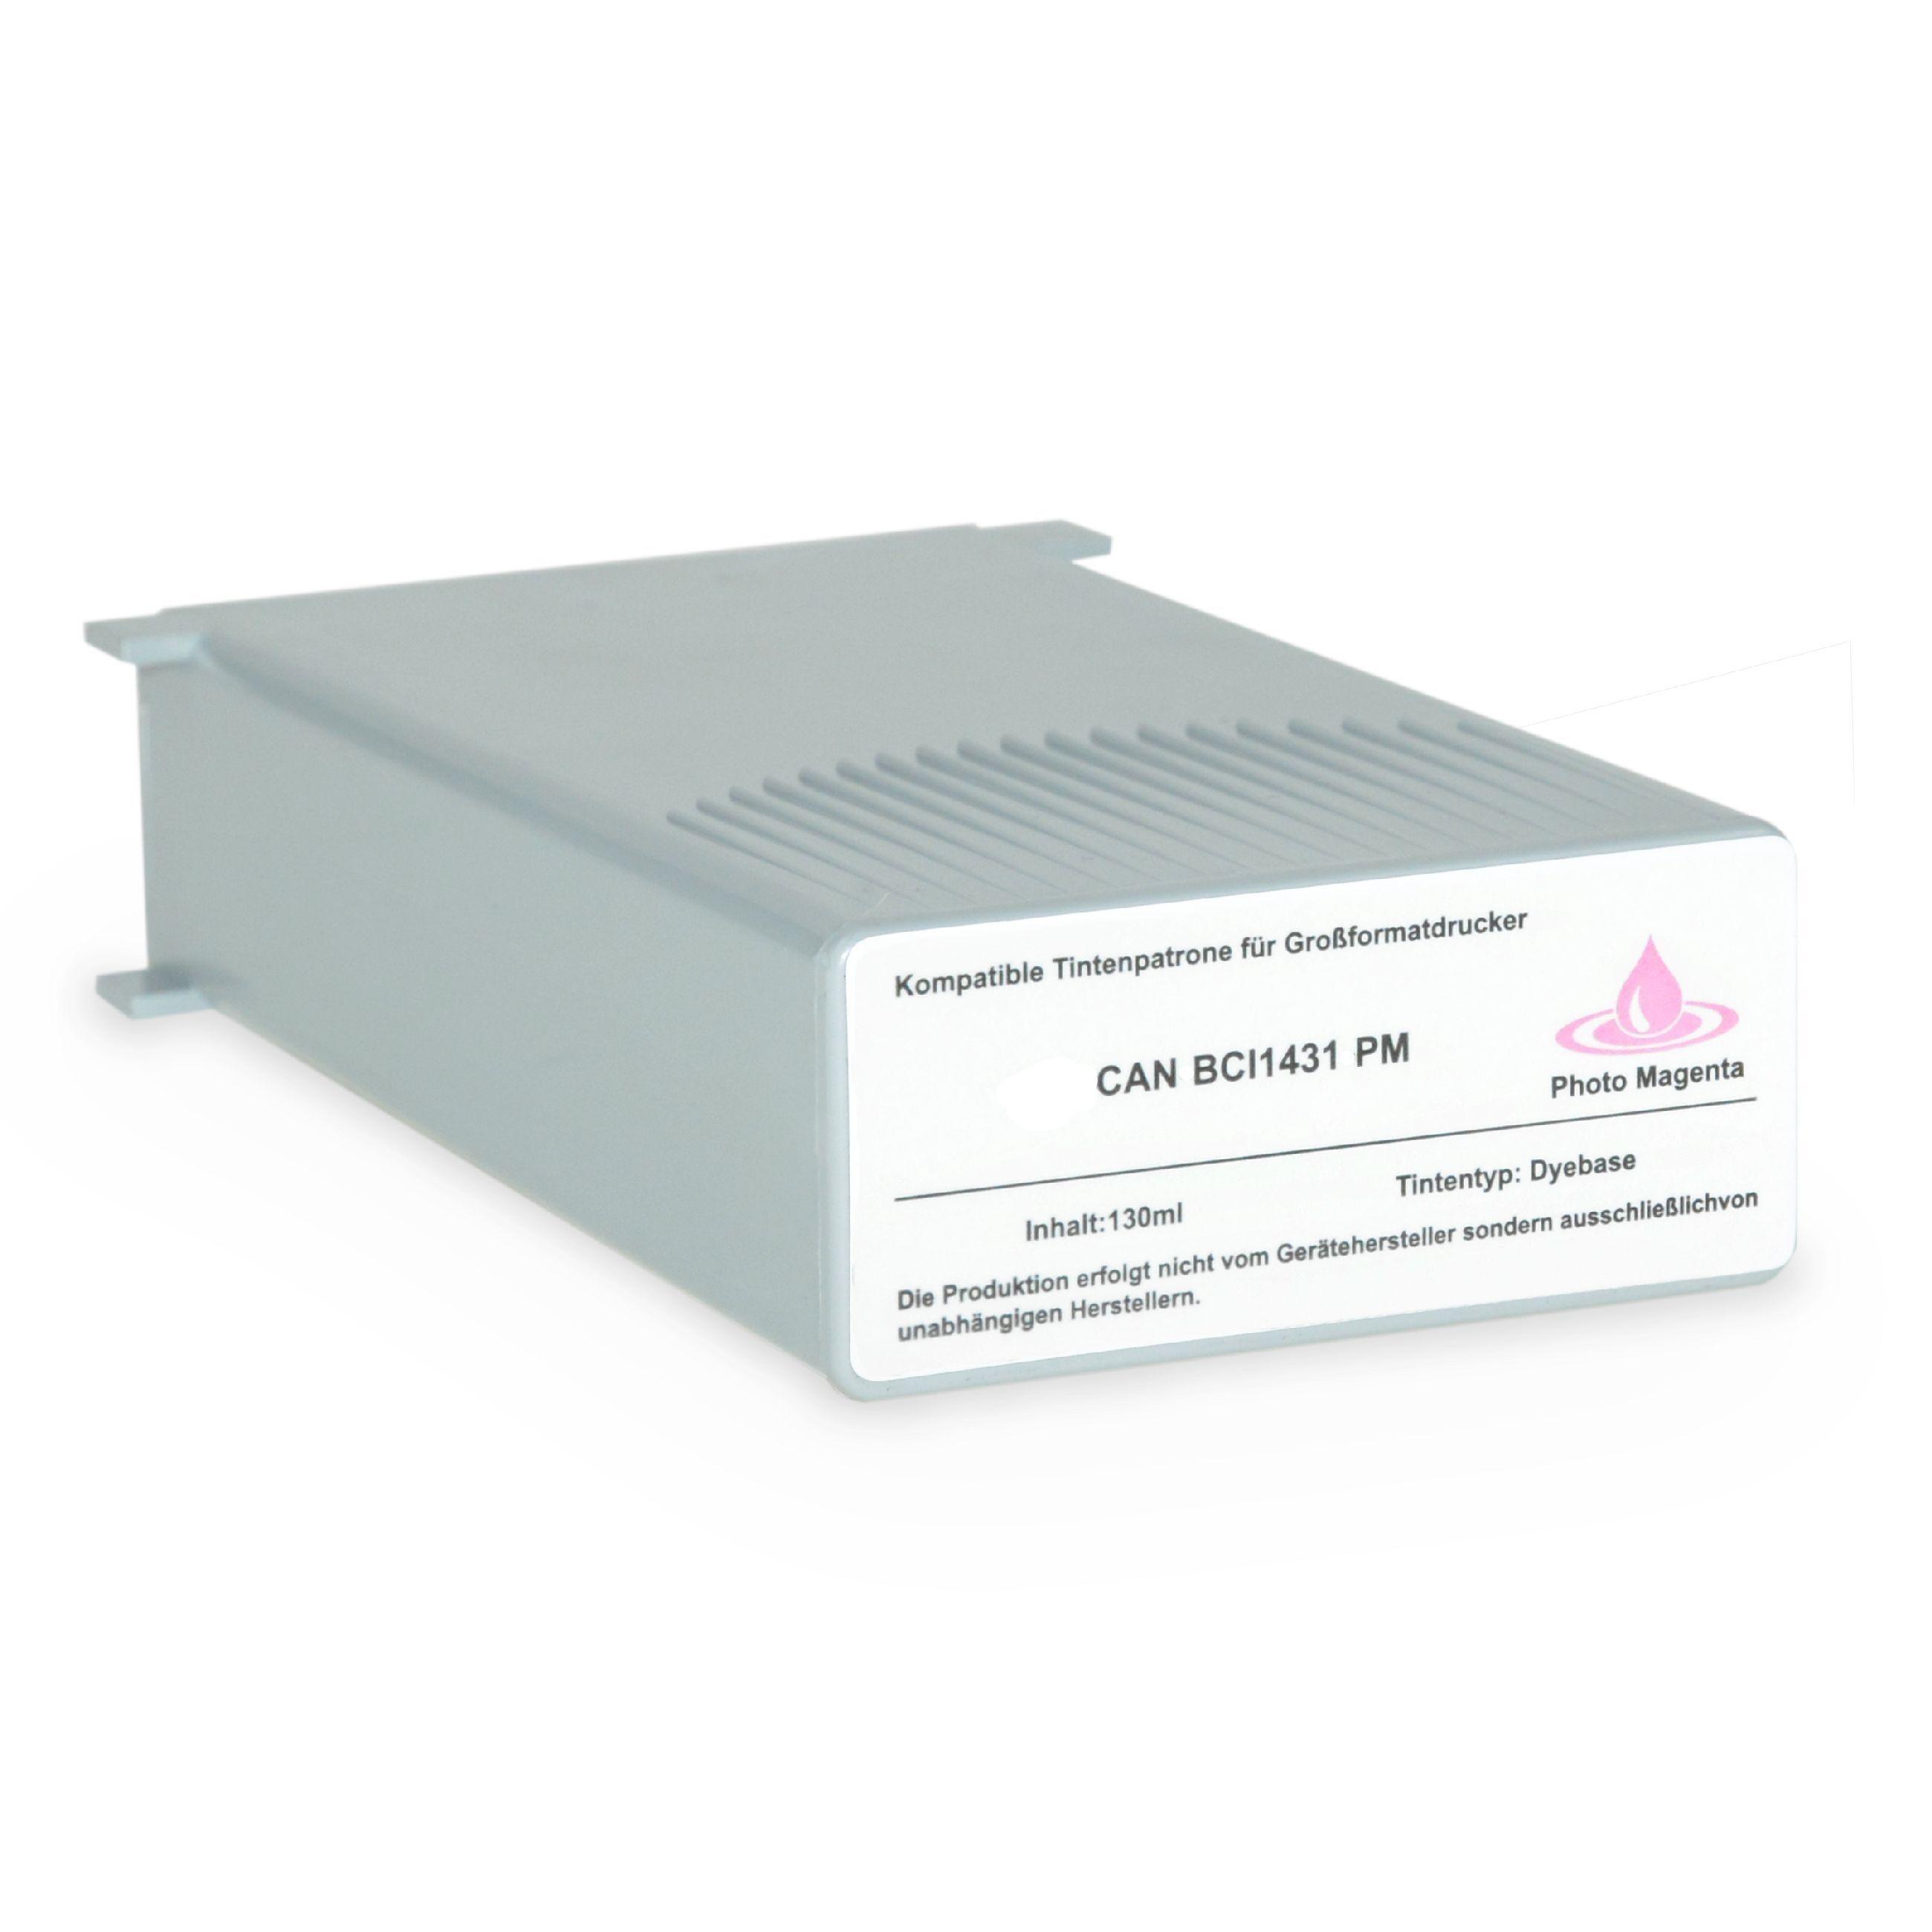 CANON Cartouche d'encre pour CANON 8974A001 / BCI-1431 PM Magenta-photo compatible (de marque ASC)